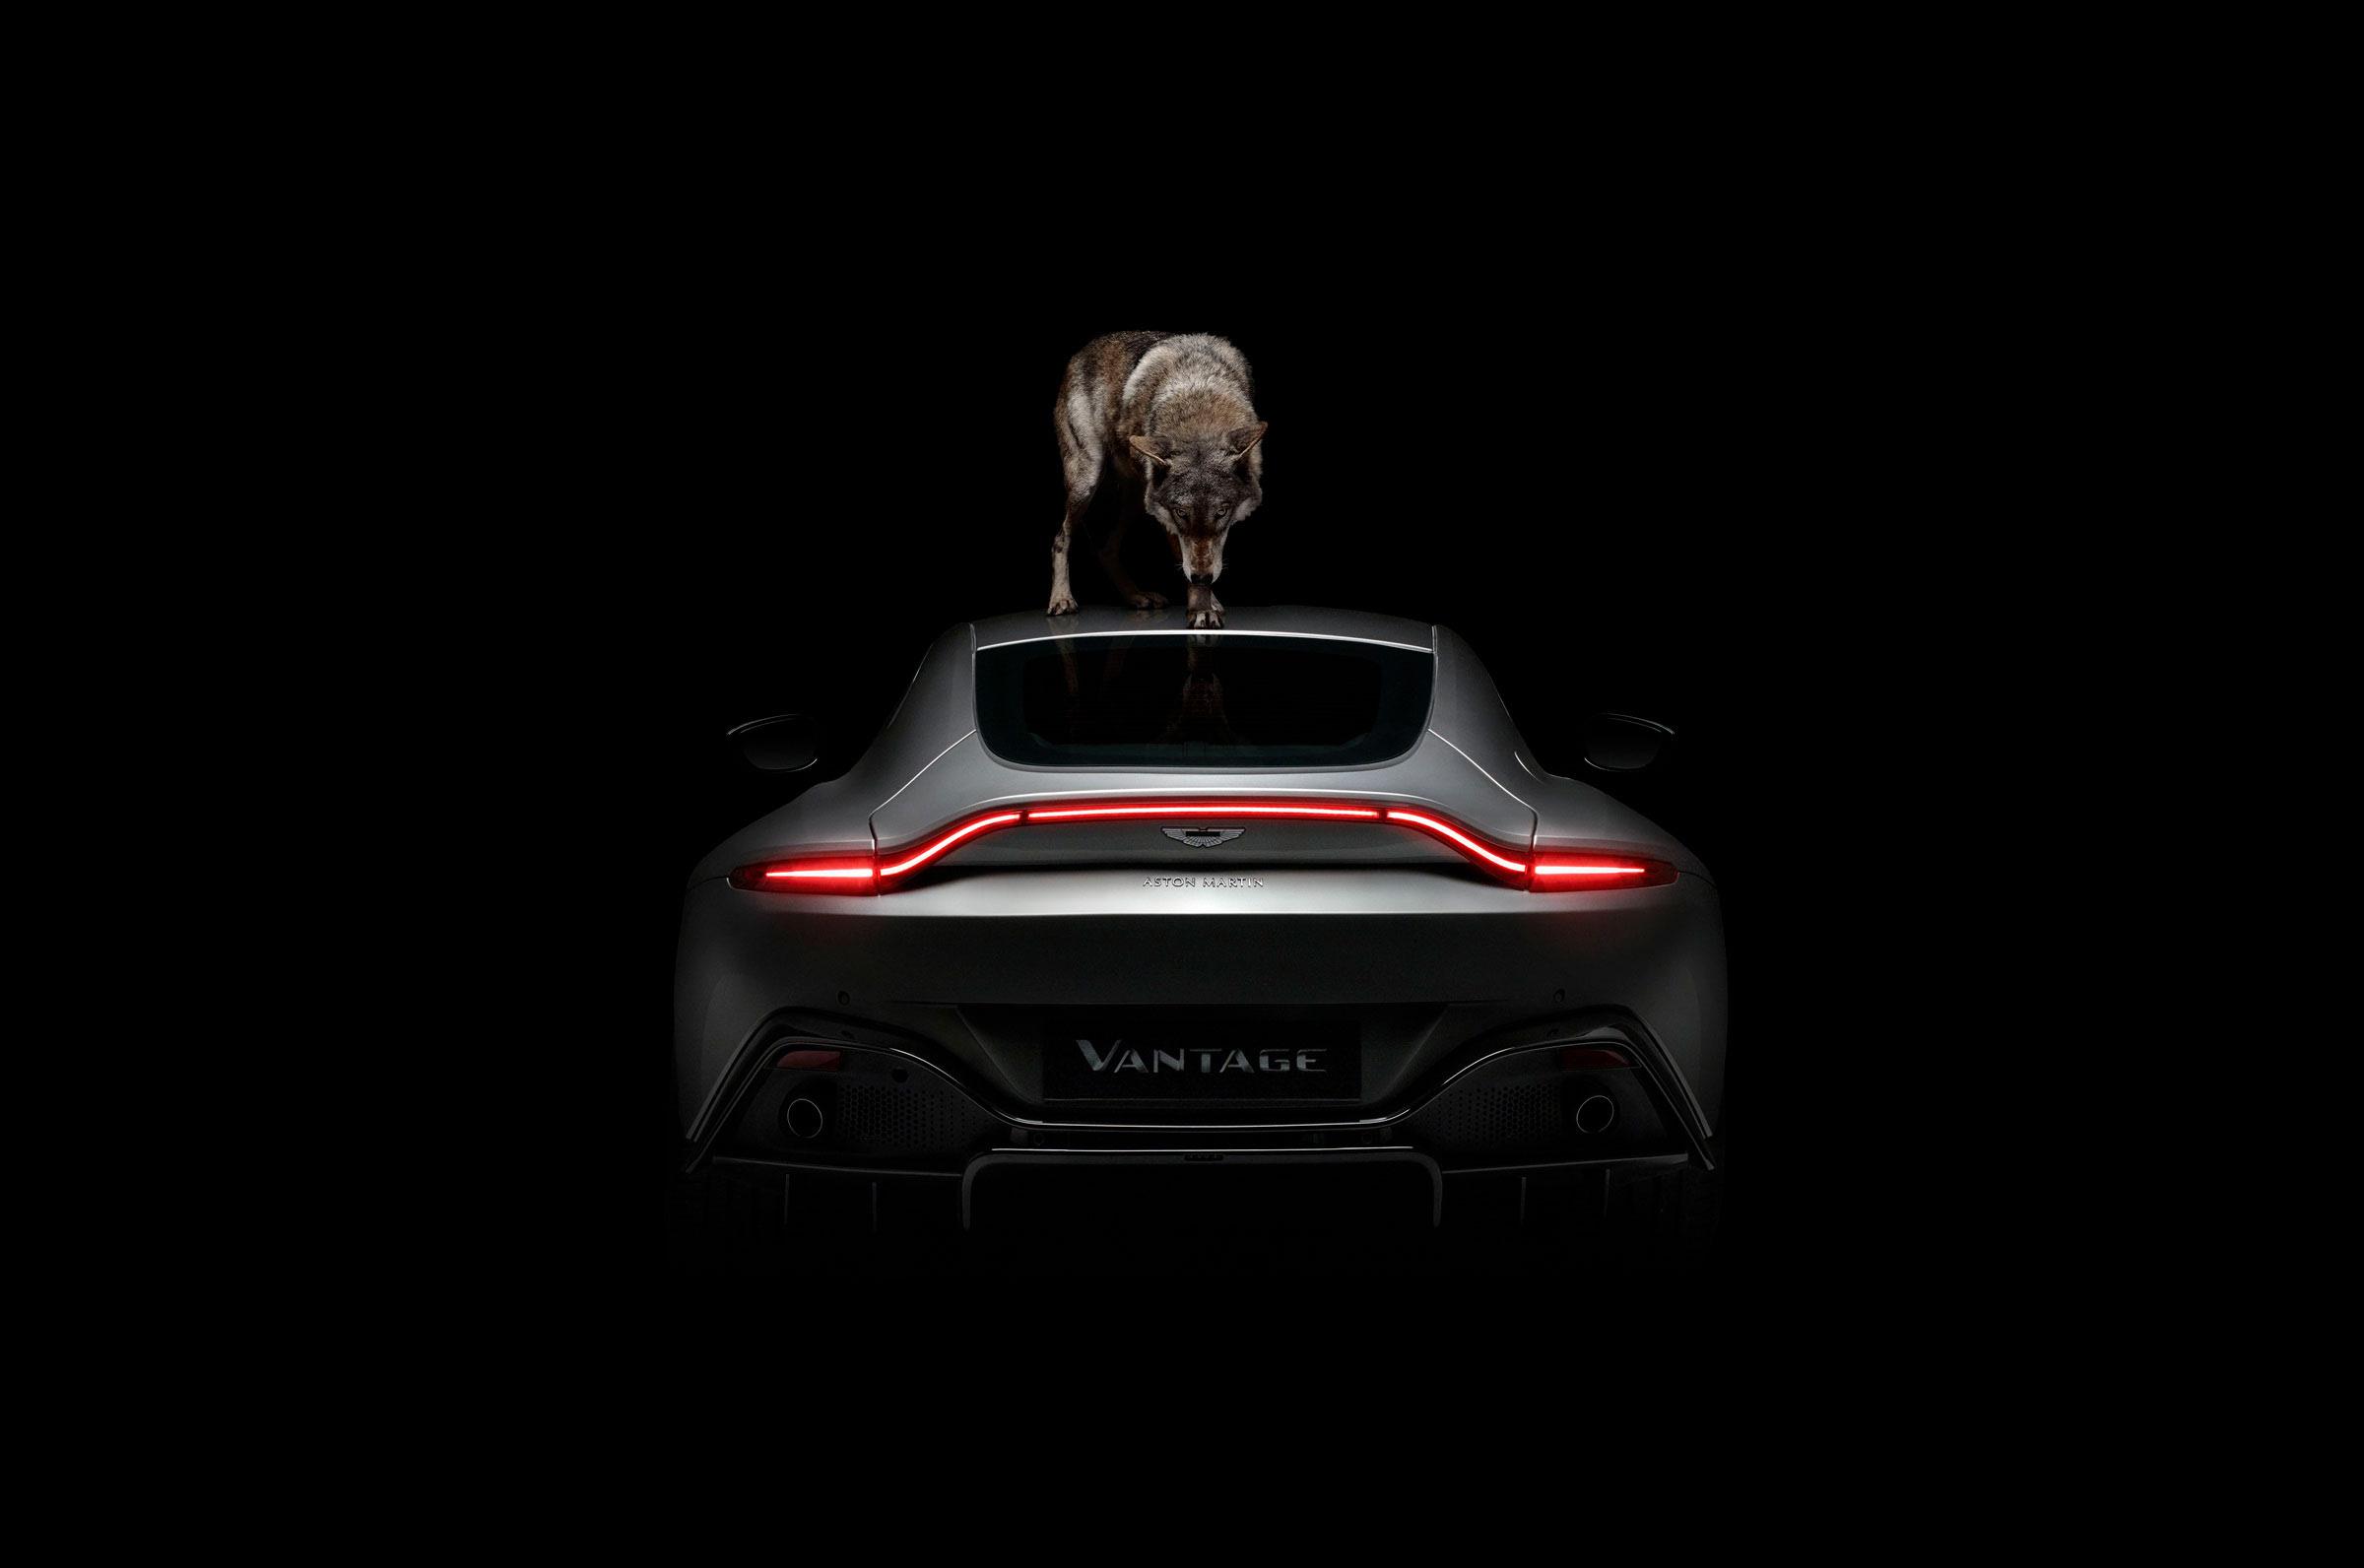 Rankin Brings His Vision To The New Aston Martin Vantage